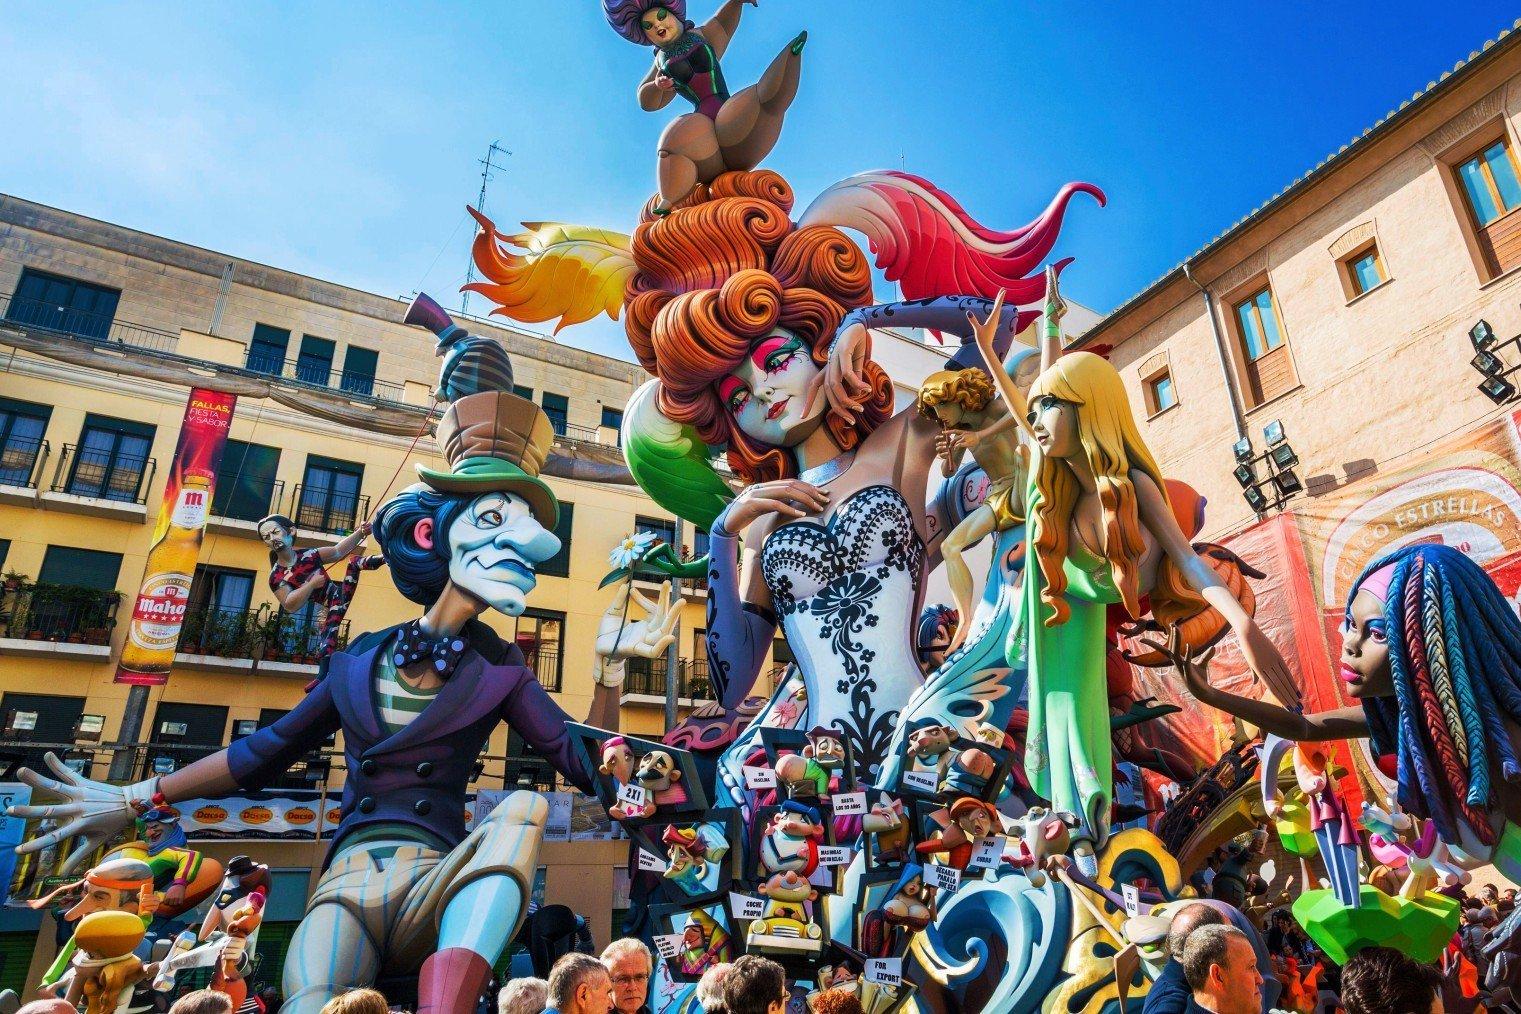 Falles Festival (Fallas)